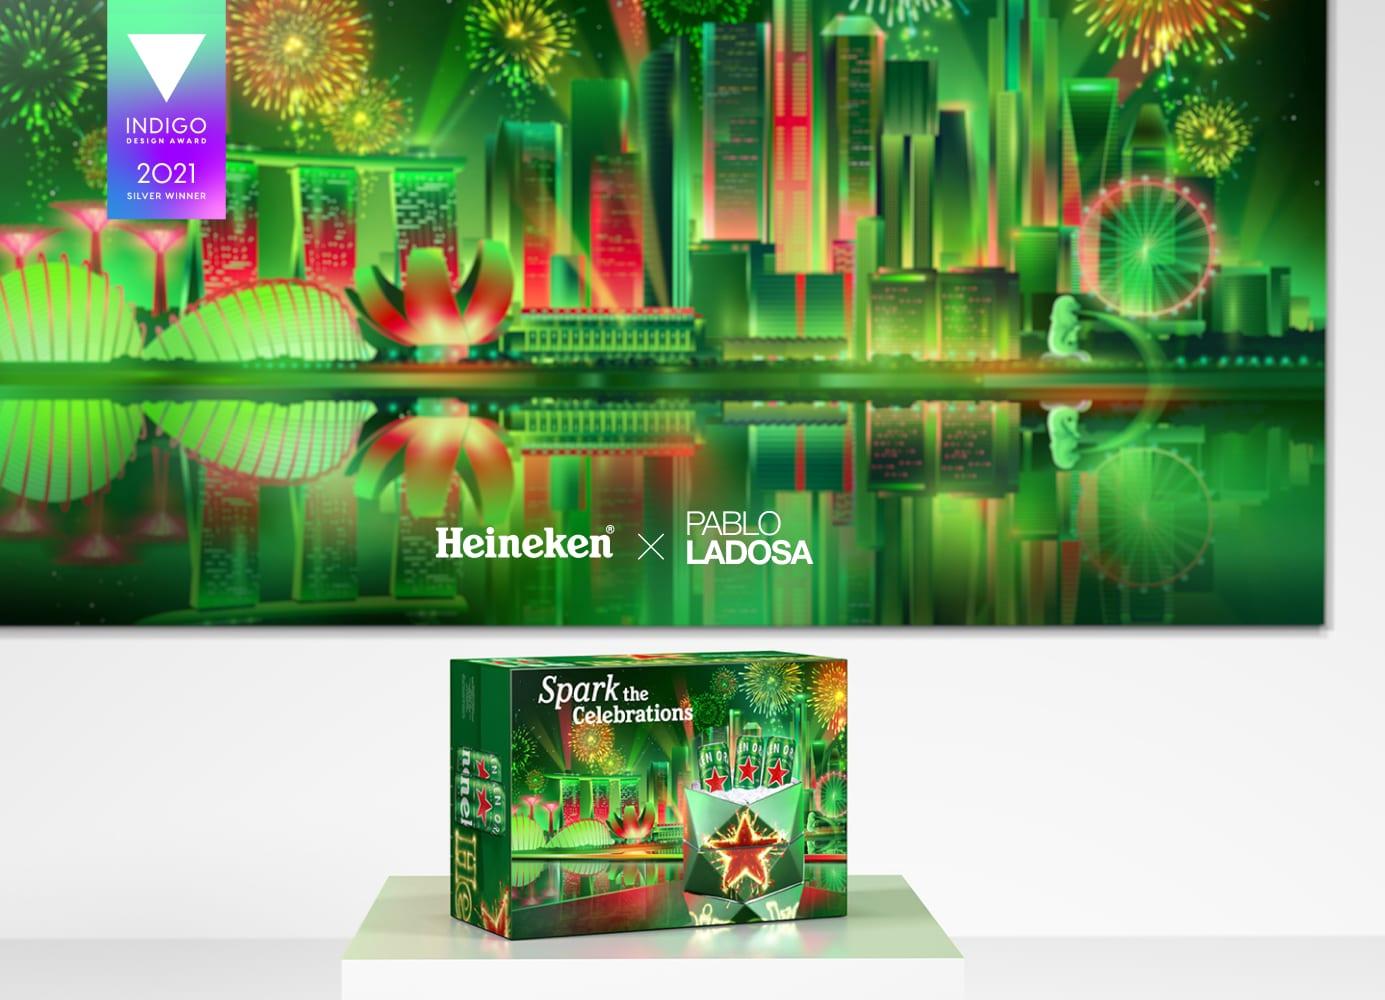 Heineken Singapore